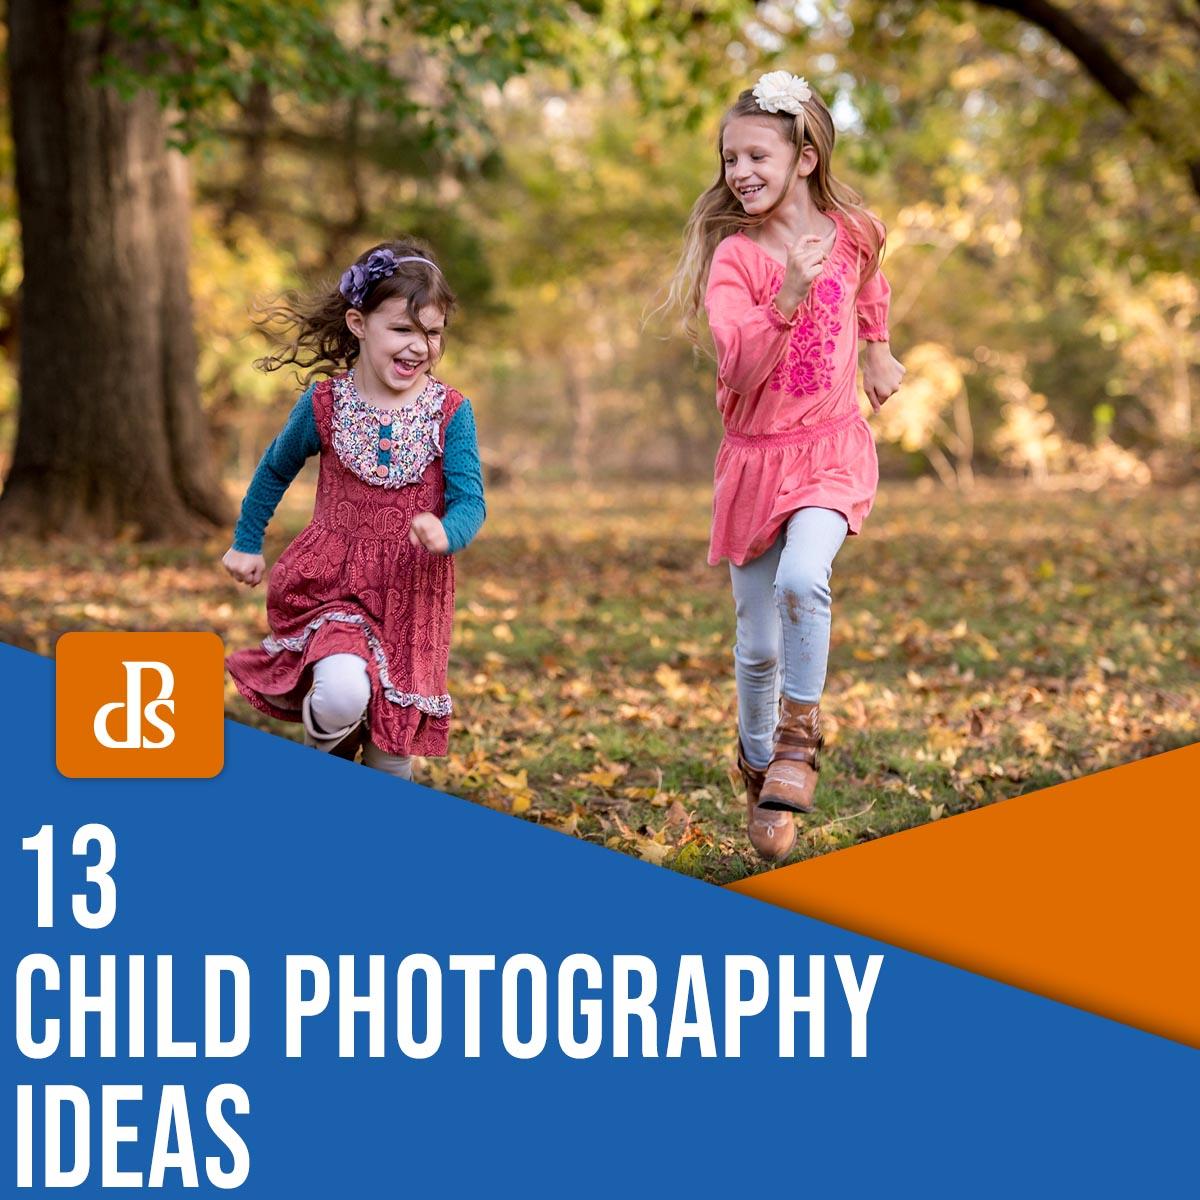 13 child photography ideas